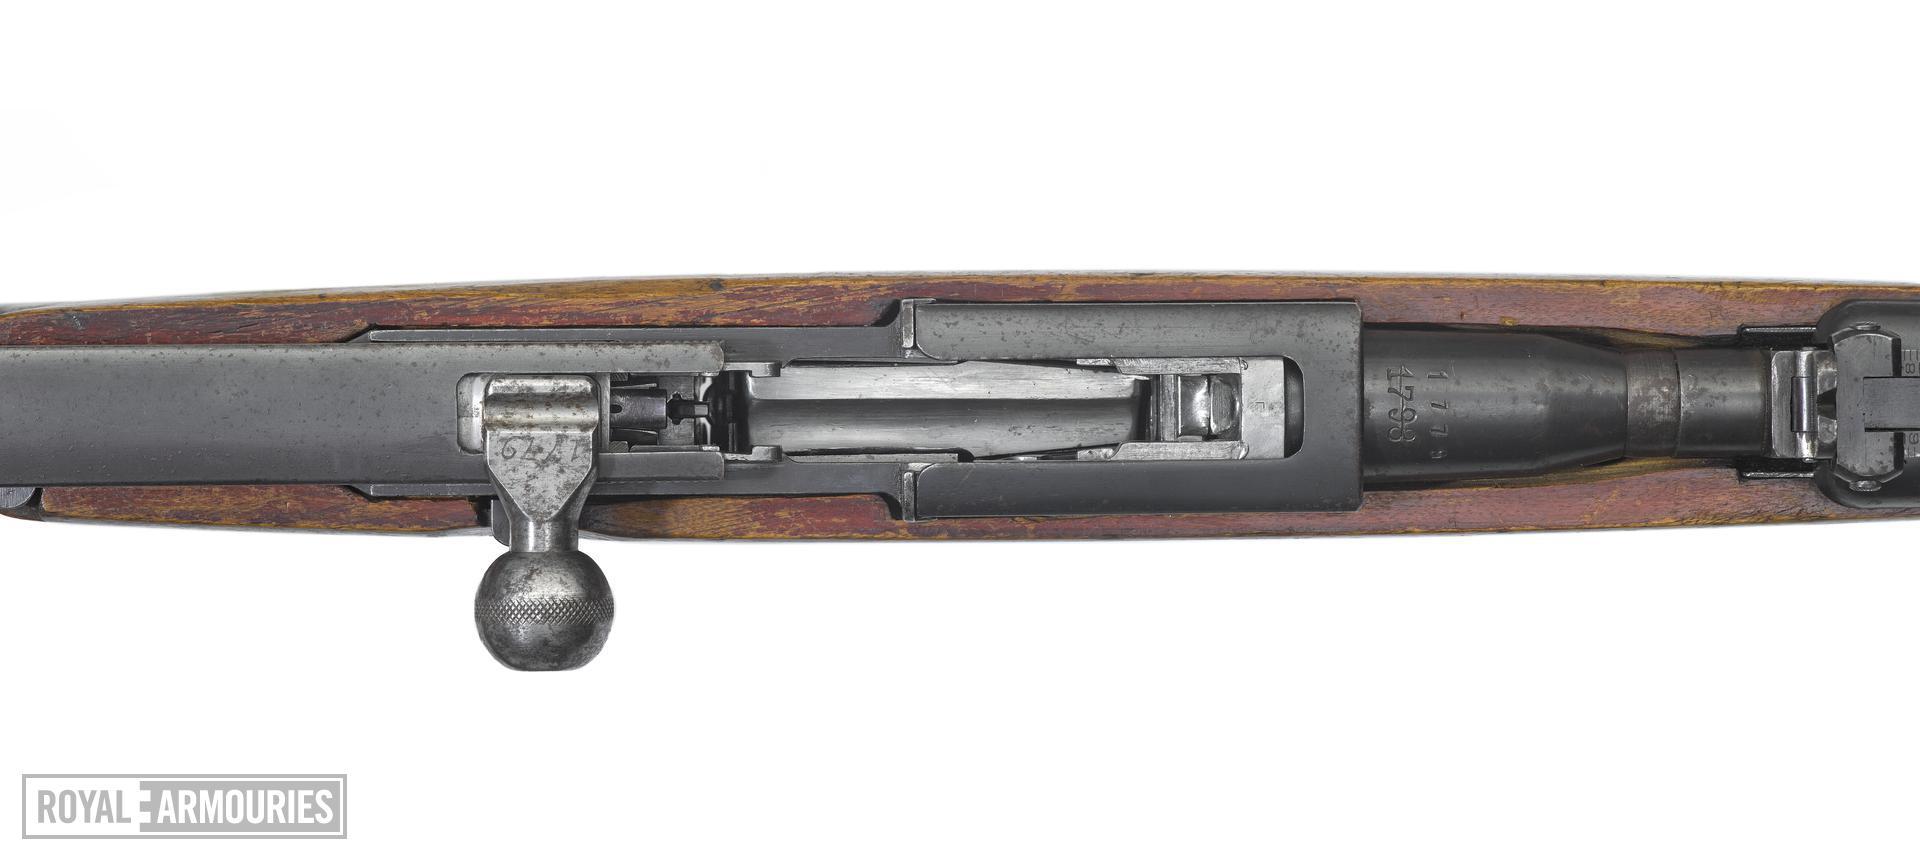 Centrefire automatic rifle - Fedorov Avtomat Model 1916 rifle